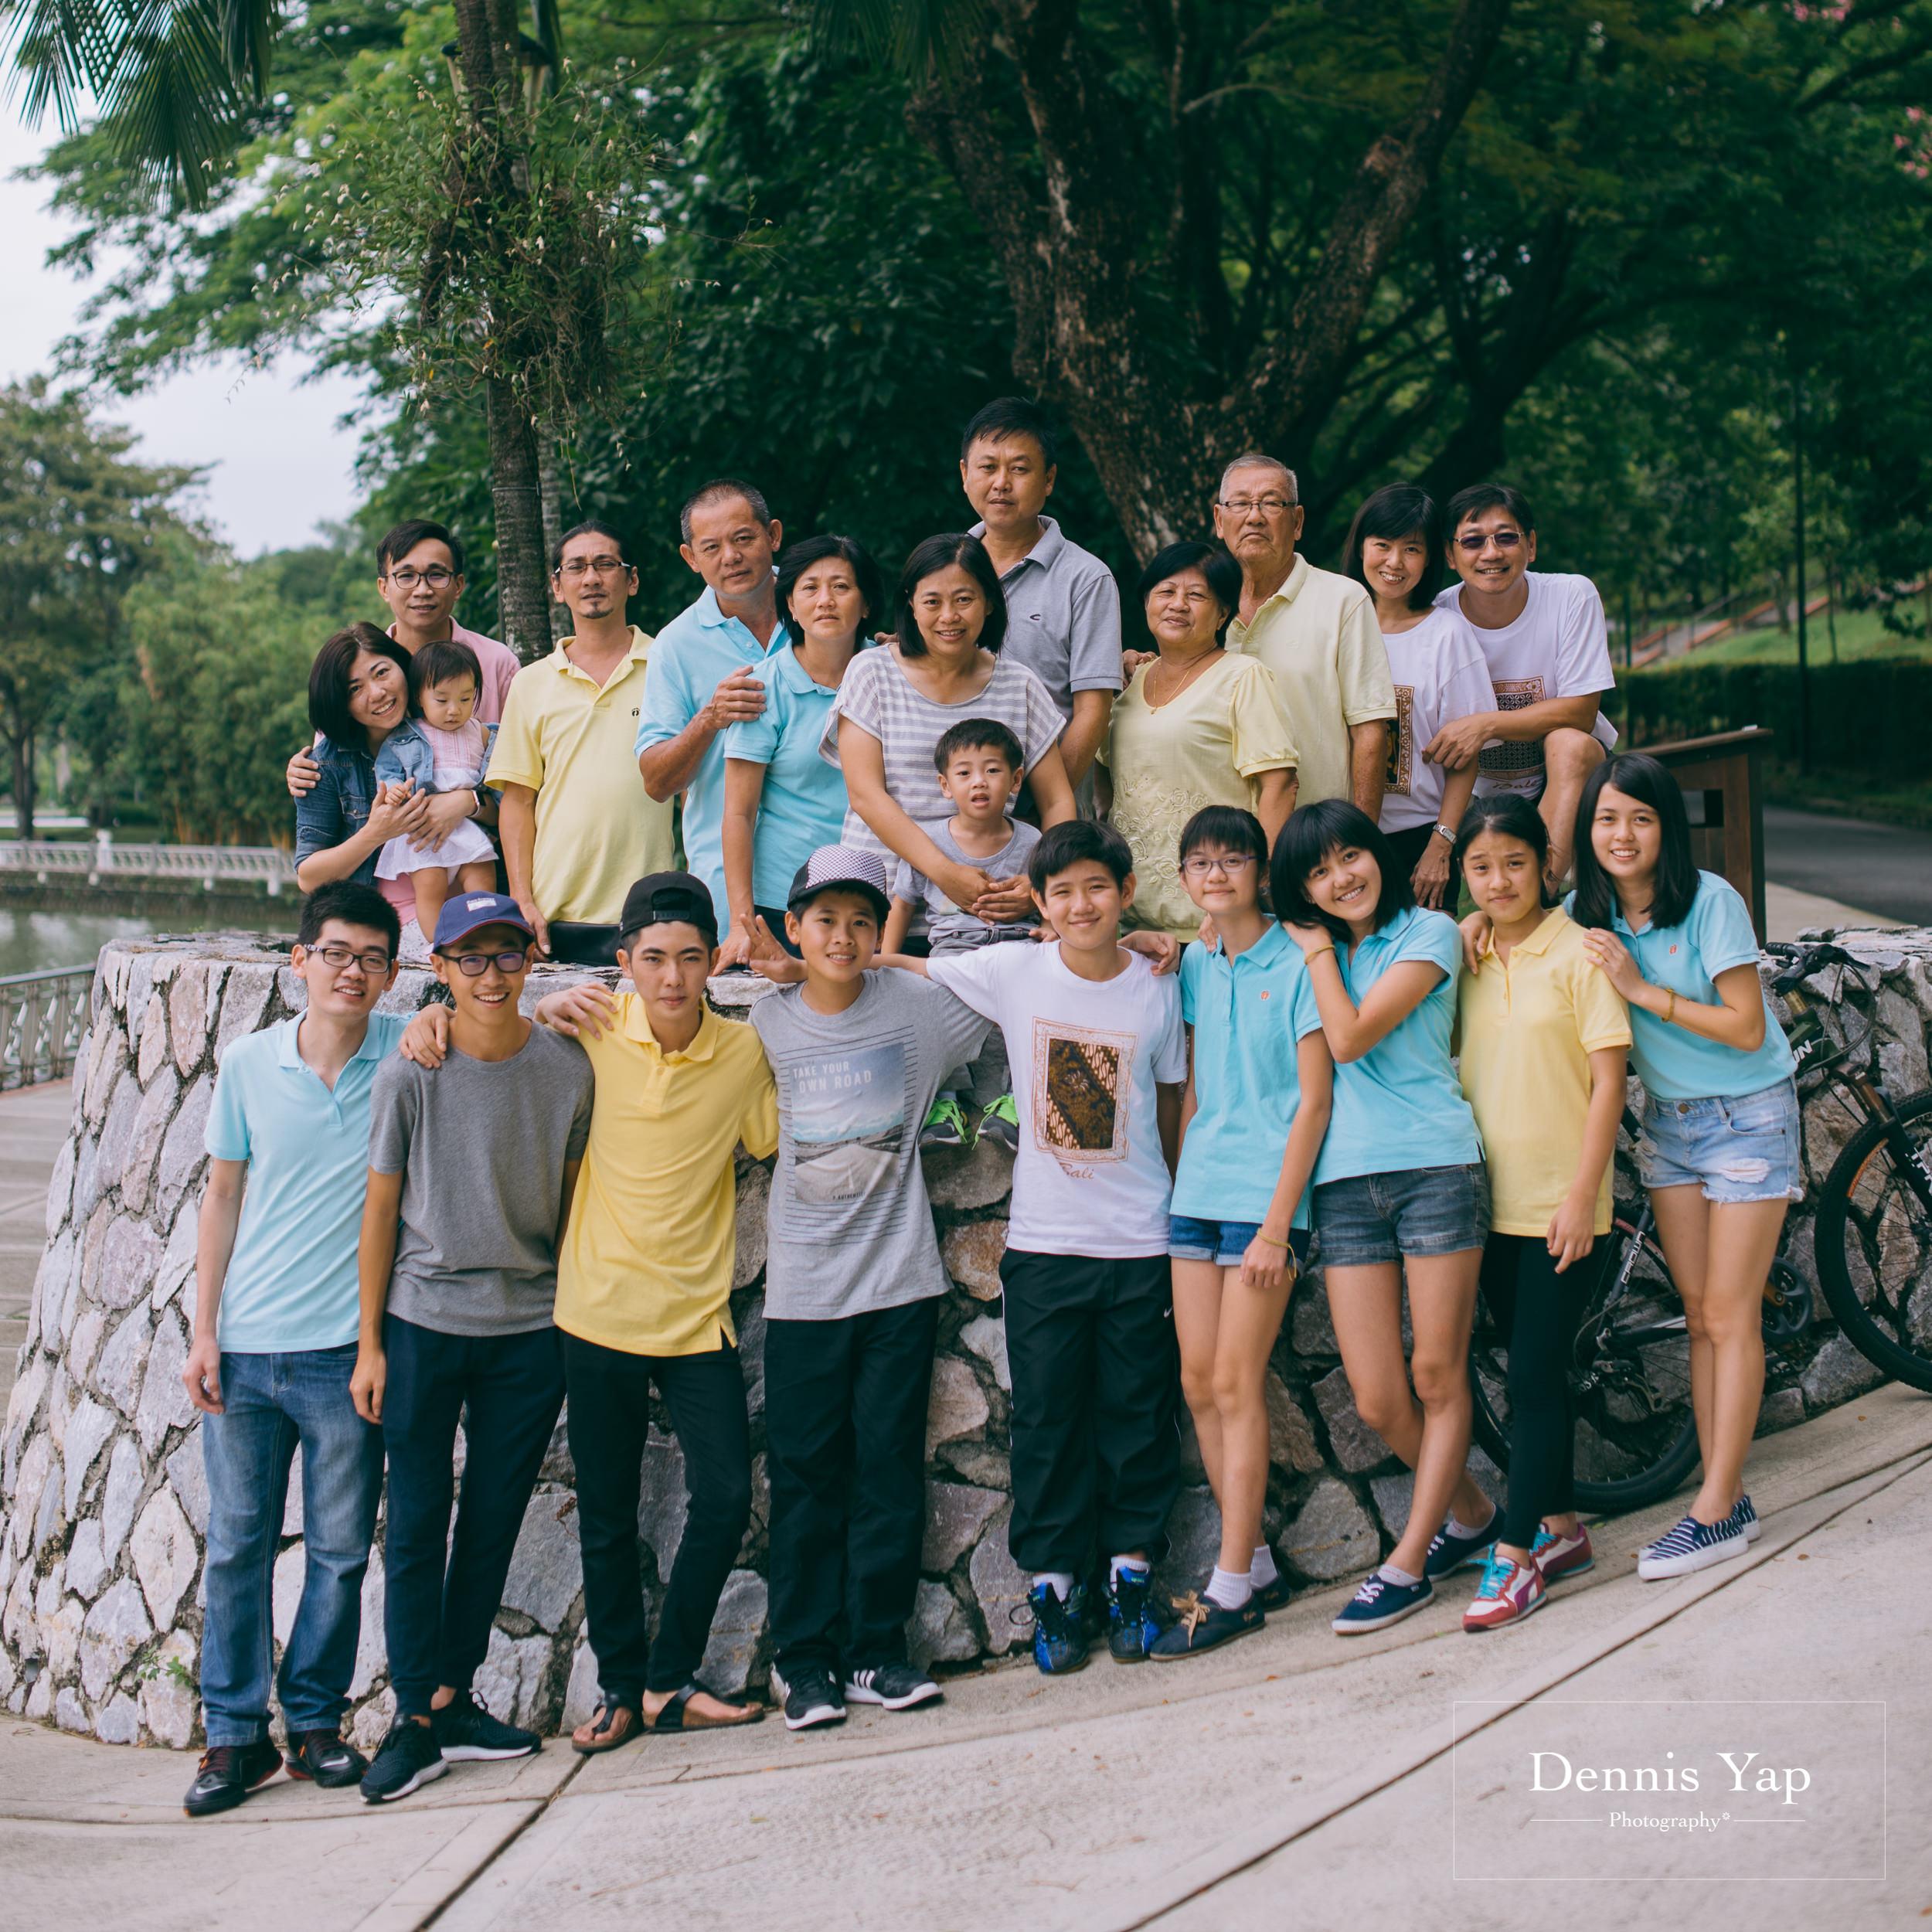 grace ang family portrait lake gardens dennis yap photography-24.jpg